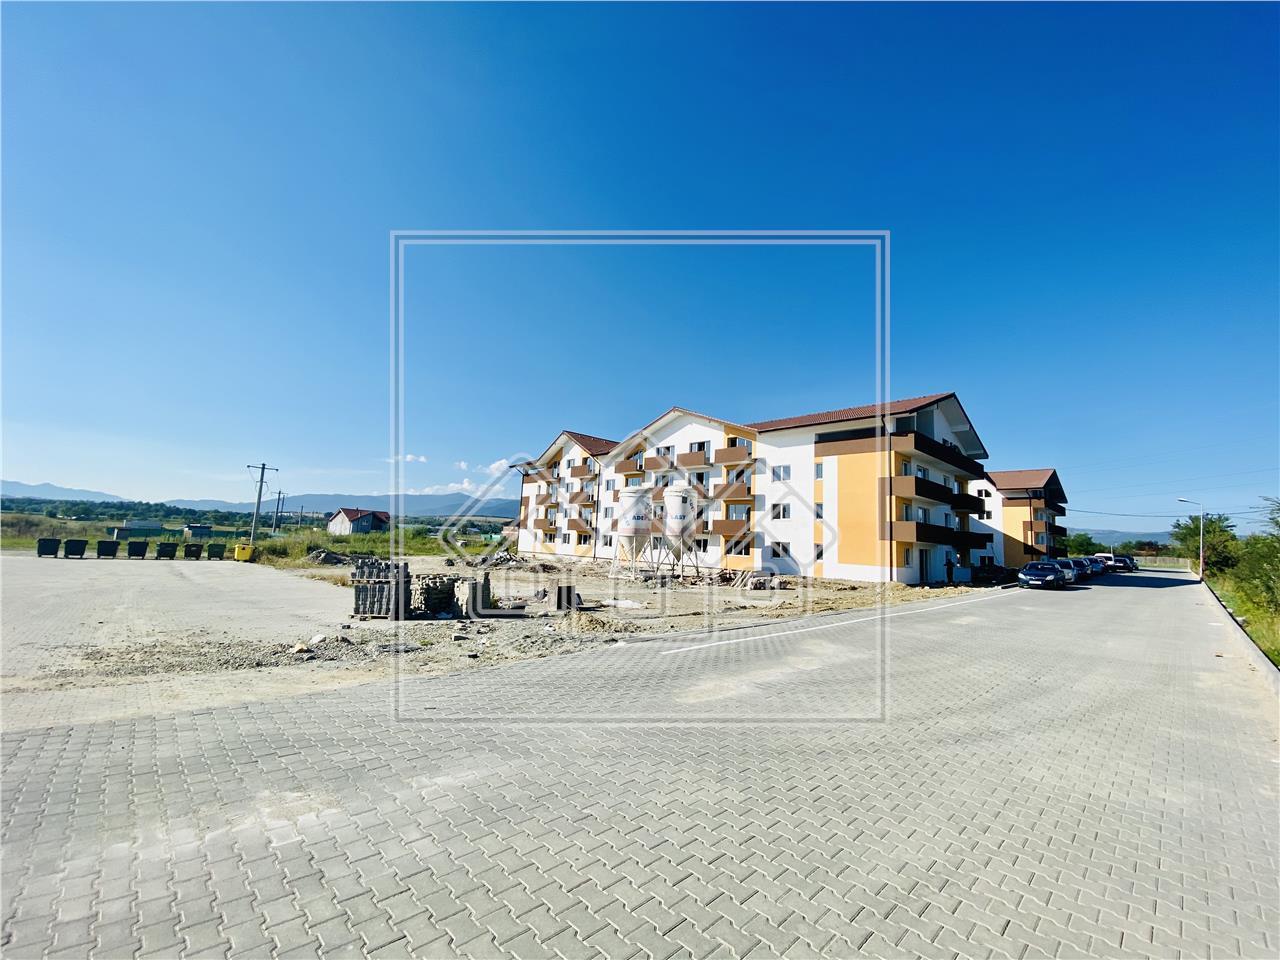 Apartament de vanzare in Sibiu - 3 camere, 2 bai -etaj intermediar